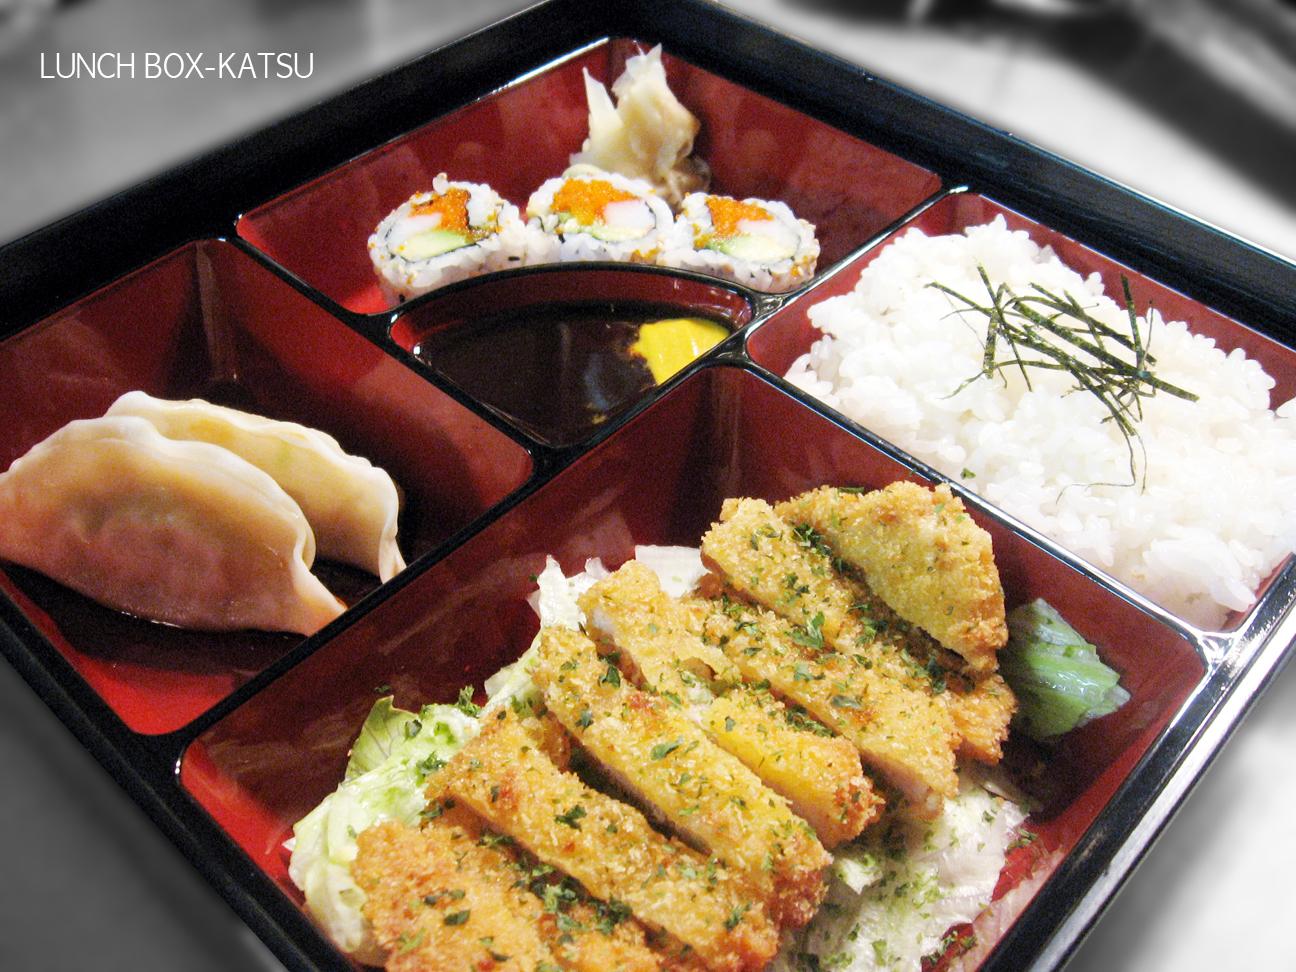 Katsu lunch box